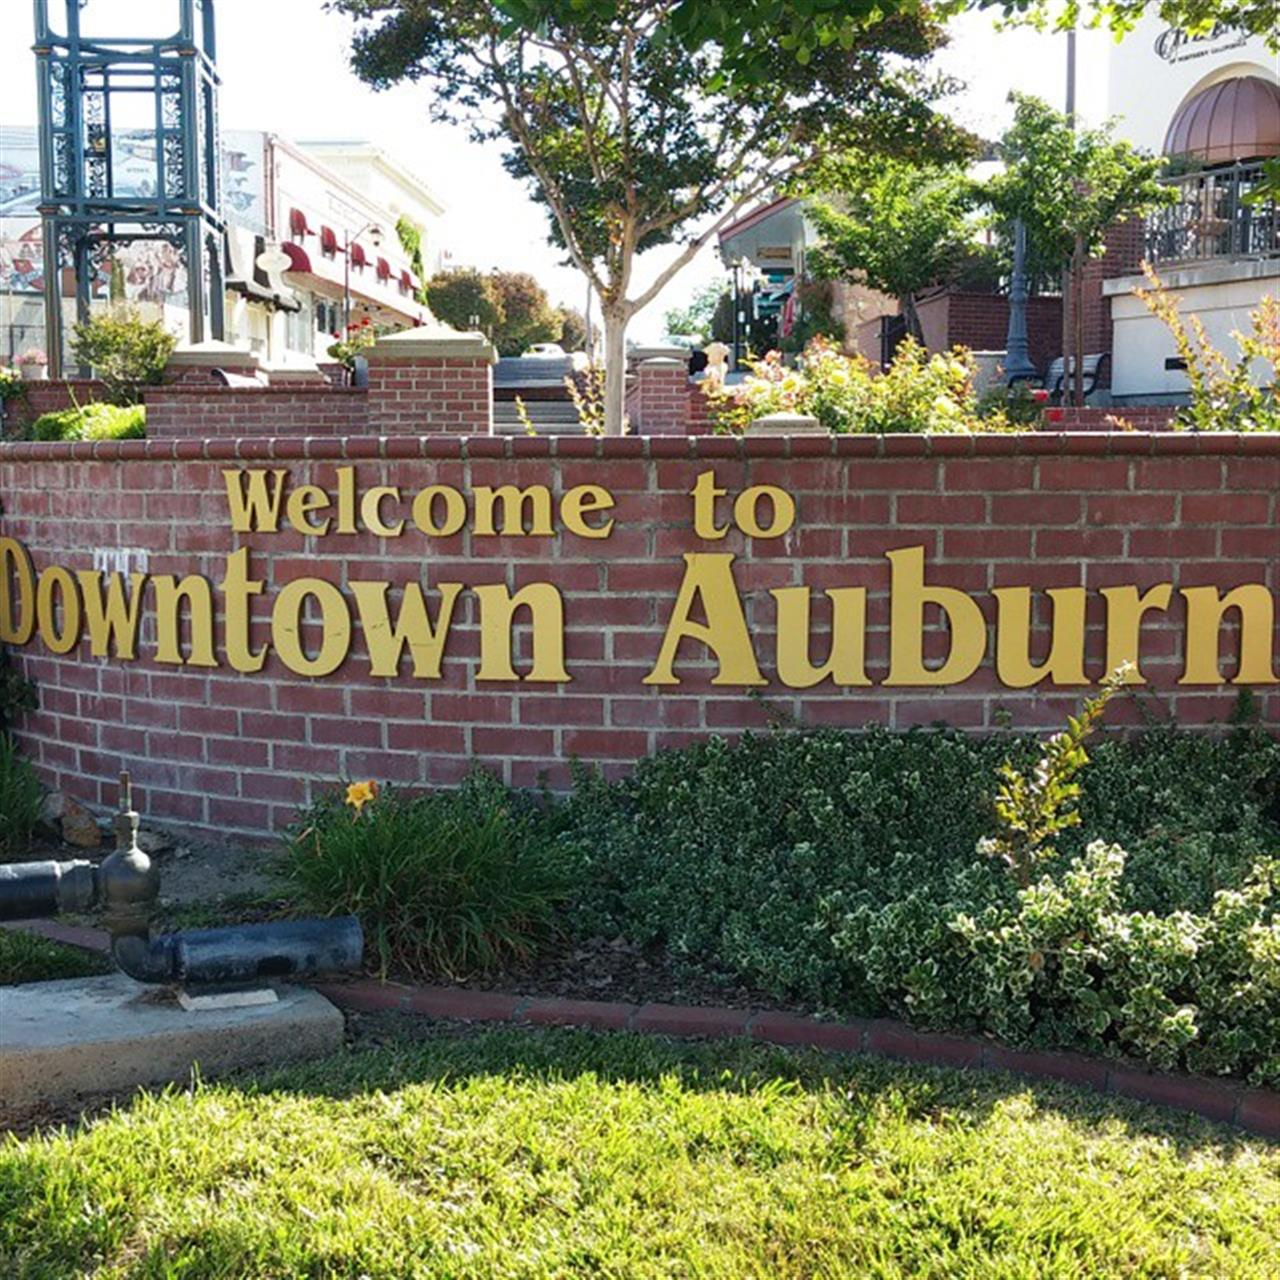 Downtown Auburn. #leadingrelocal #lyonrealestate #downtownauburn